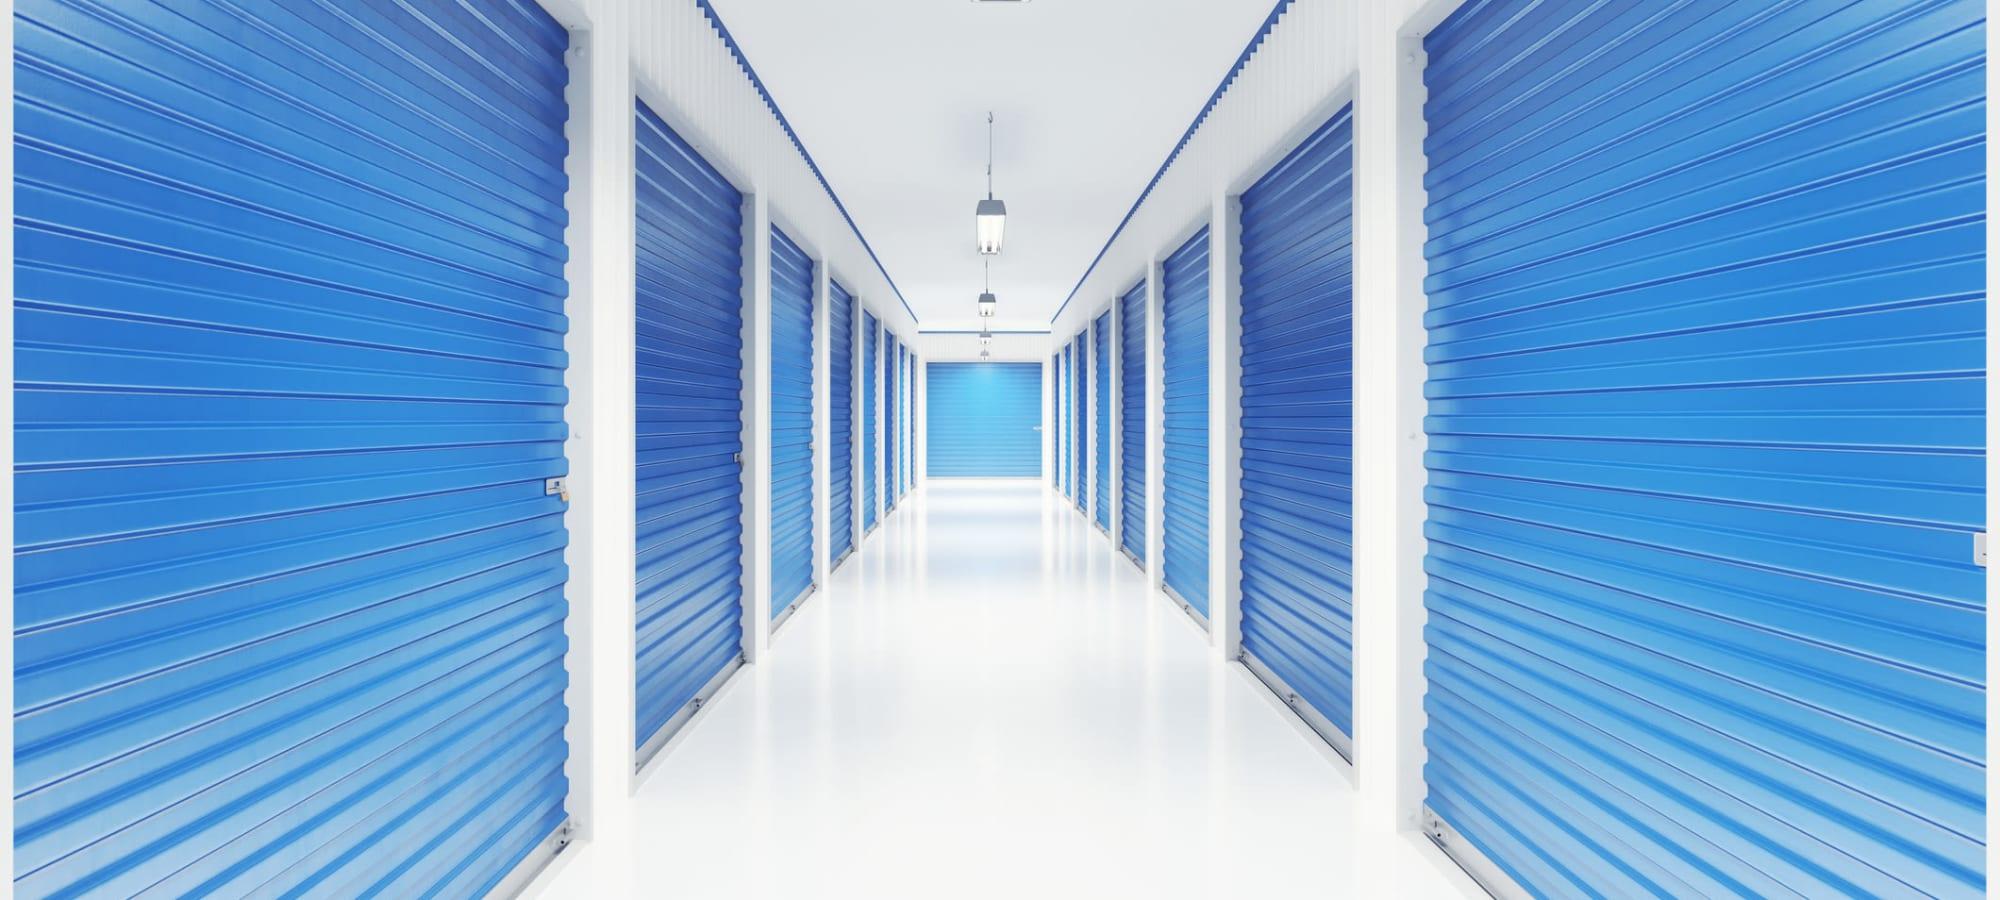 21st Century Storage self storage in Aspen, Colorado